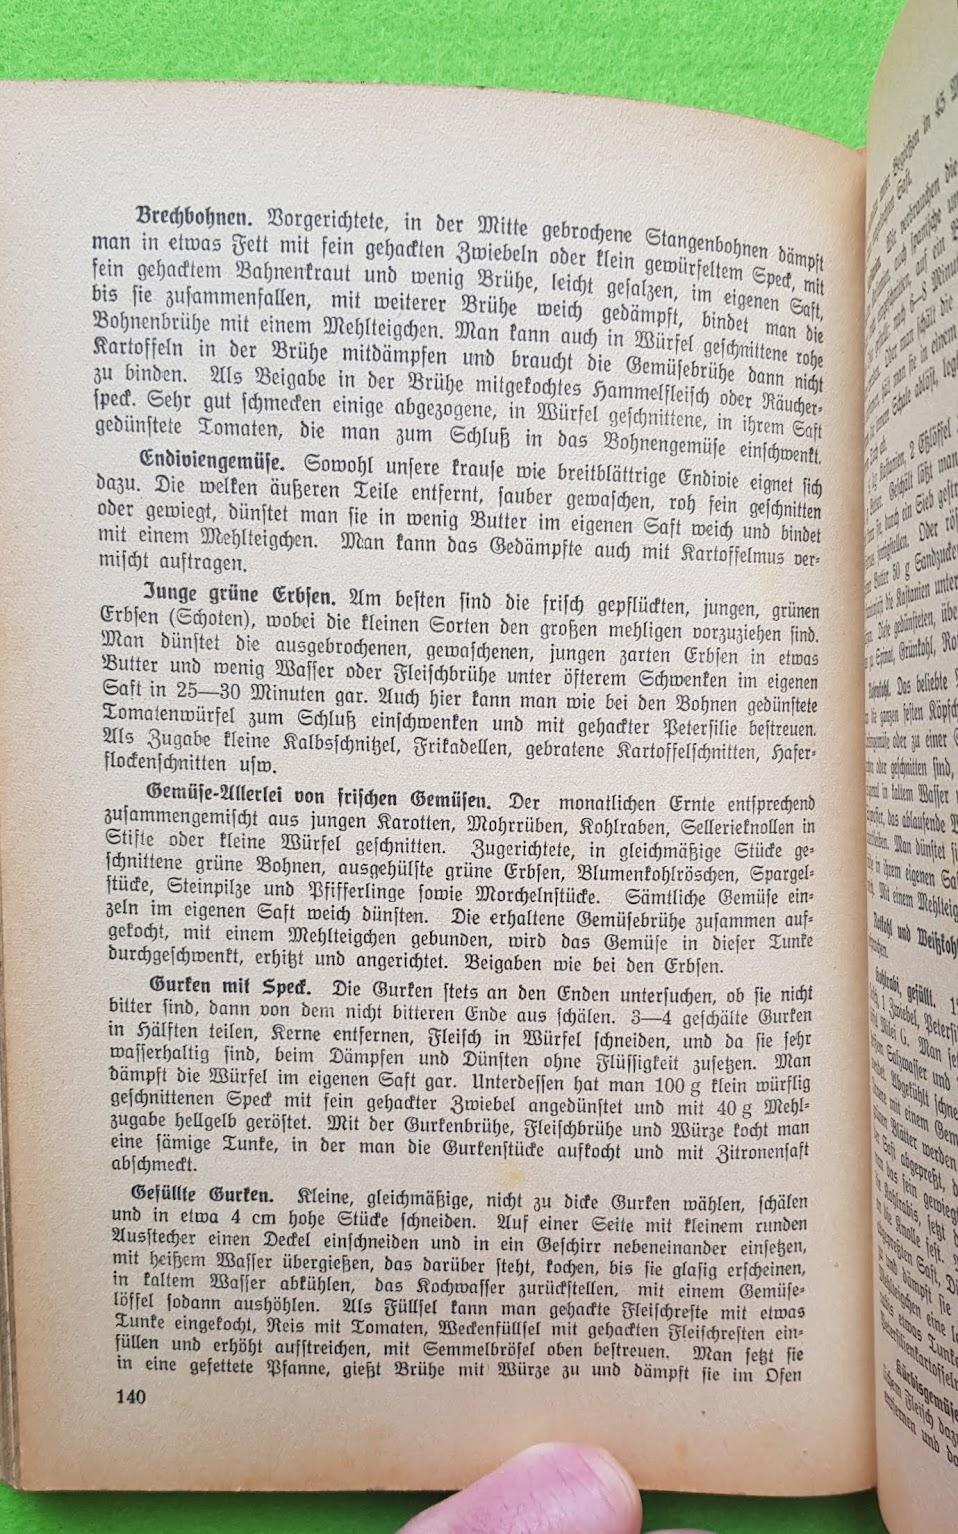 Eugen Bechtel, Nahrhaft, schmackhaft kochen - auch im Krieg!, 1940 - Hausmannskost